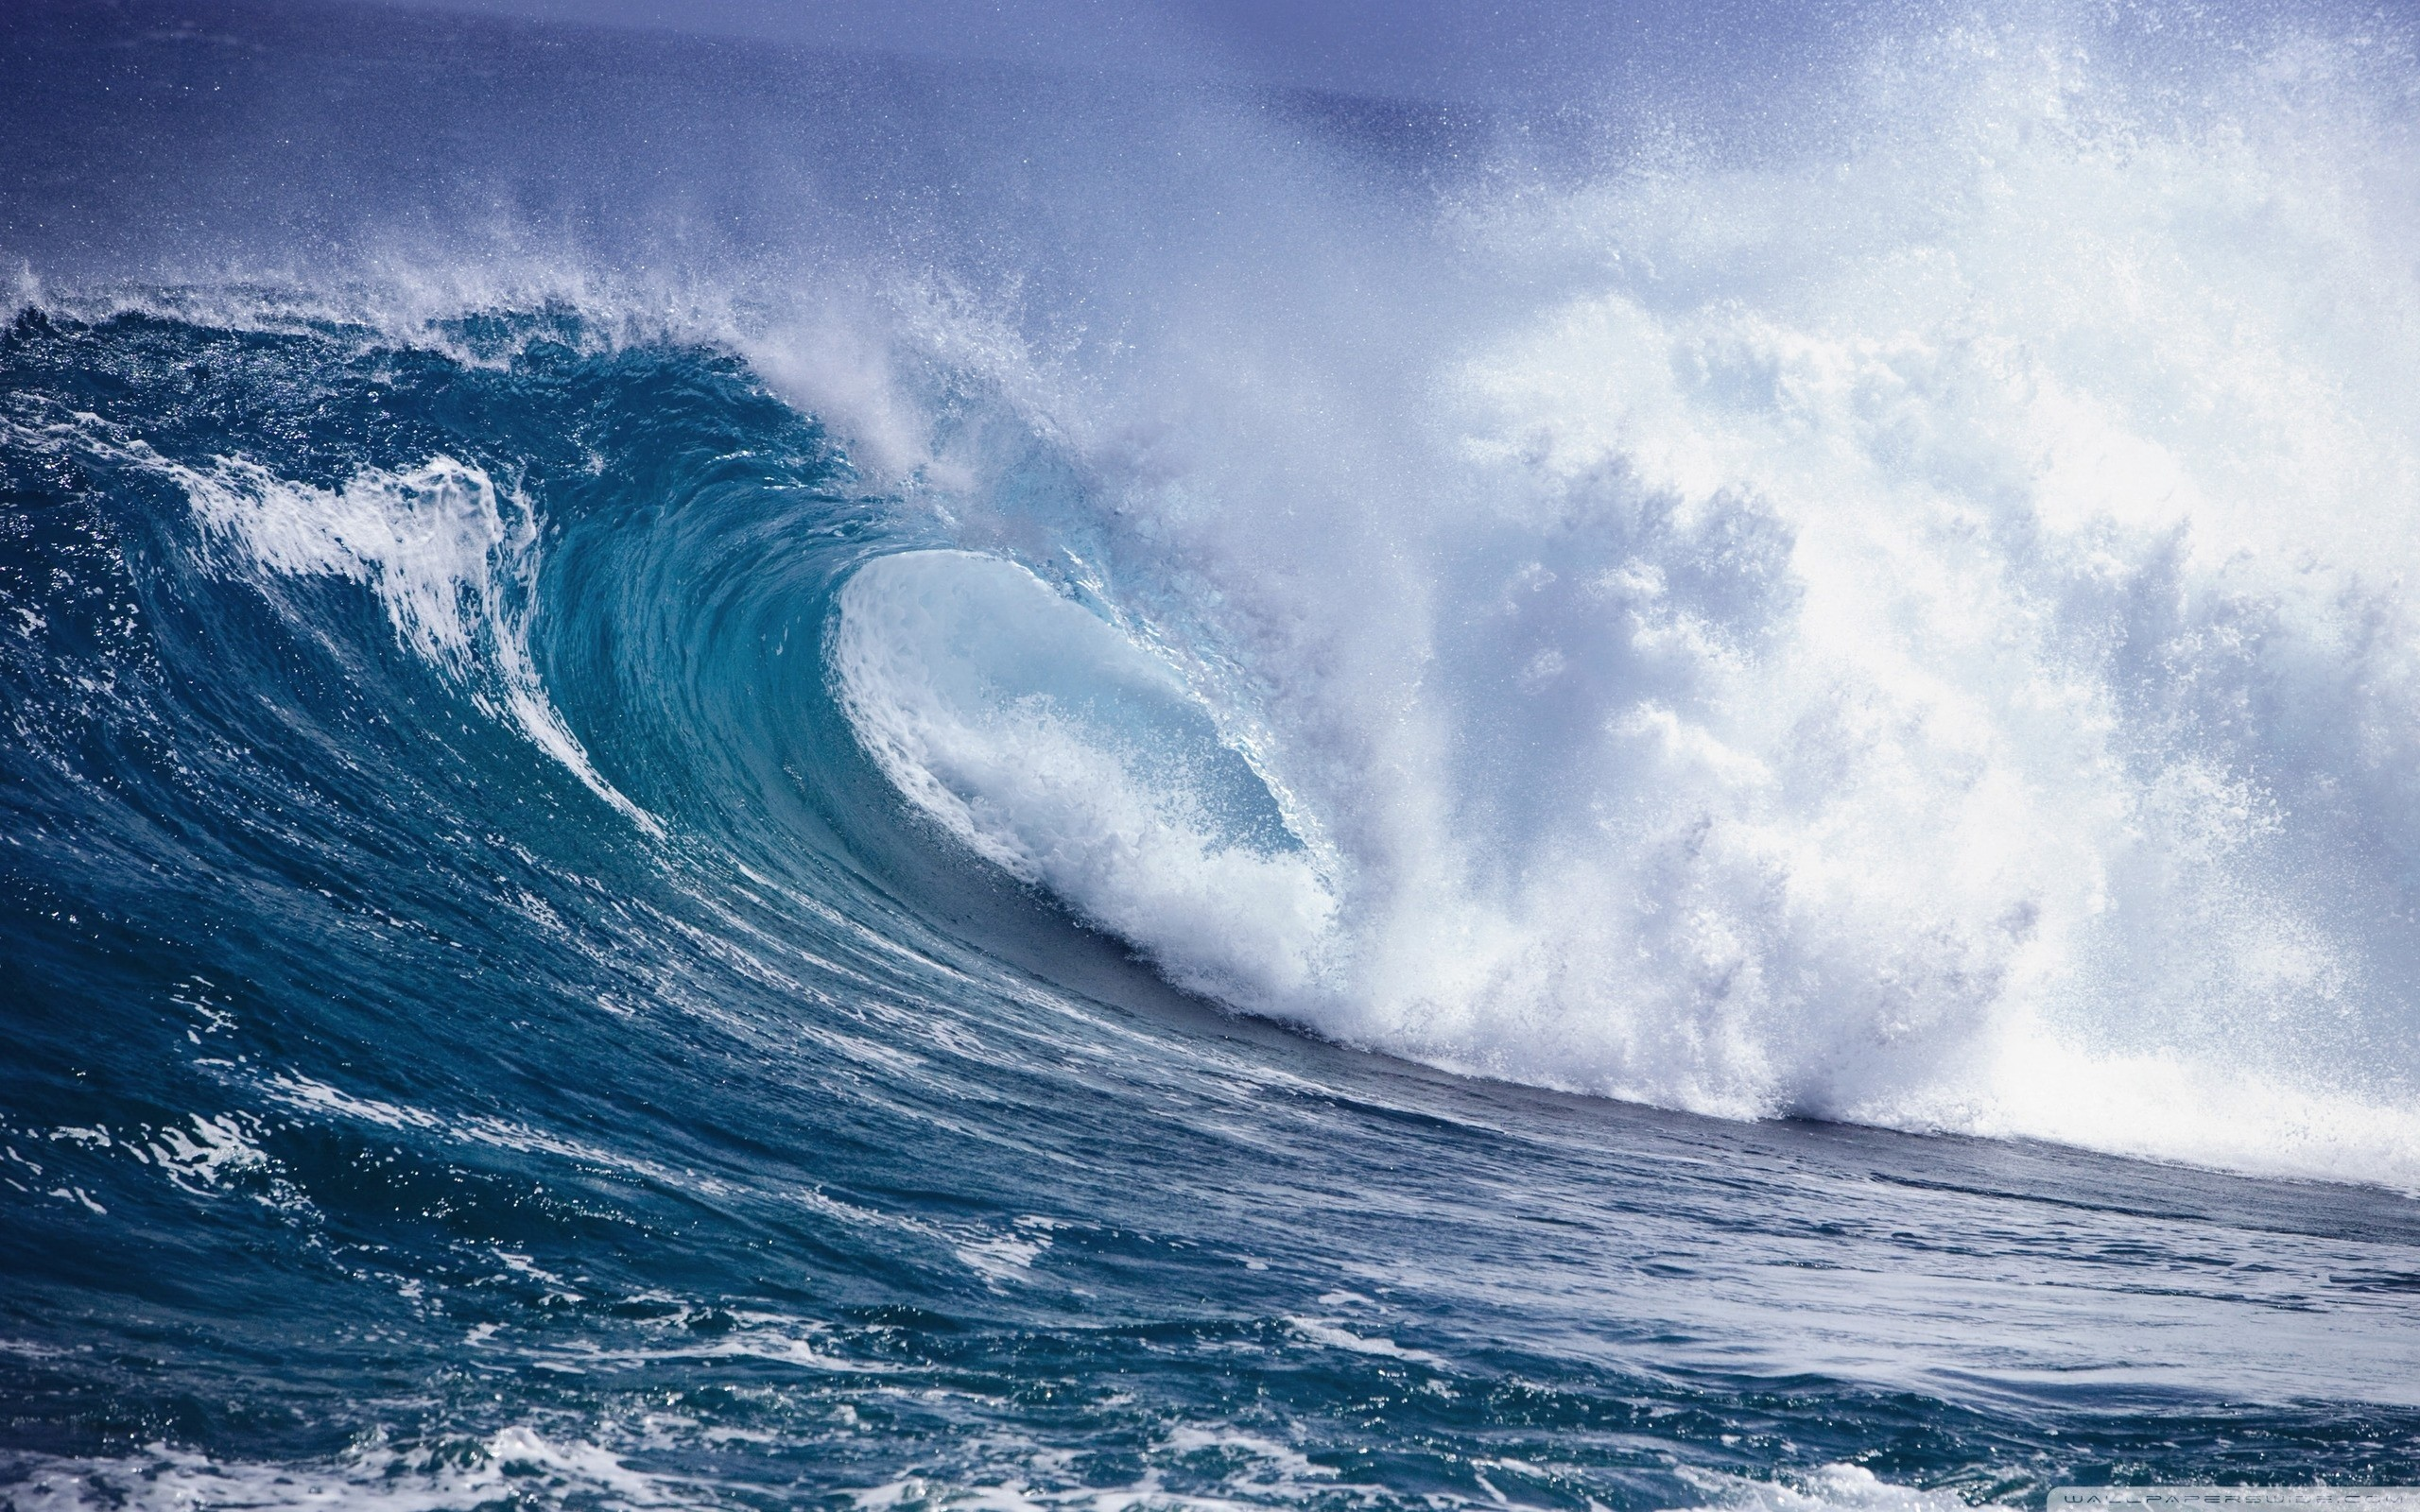 Sea Waves Wallpaper HD